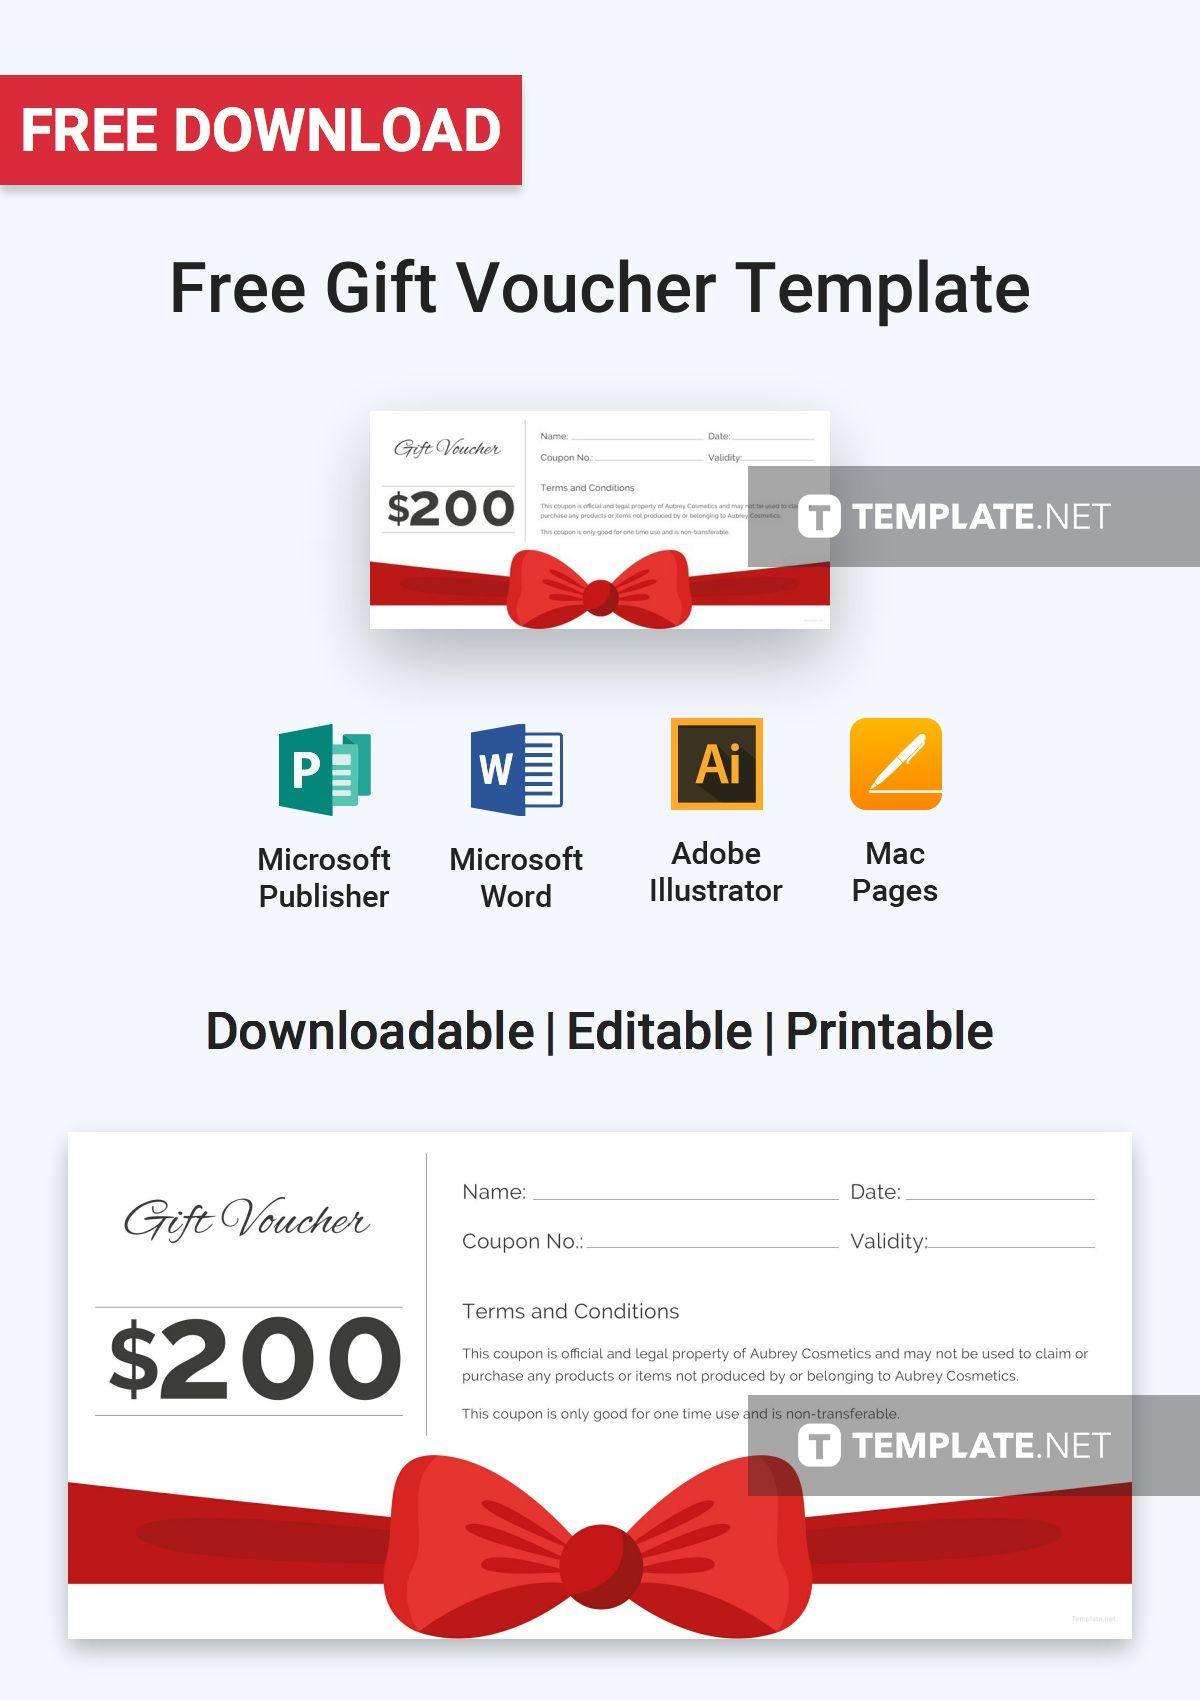 free gift voucher free voucher templates pinterest free gift